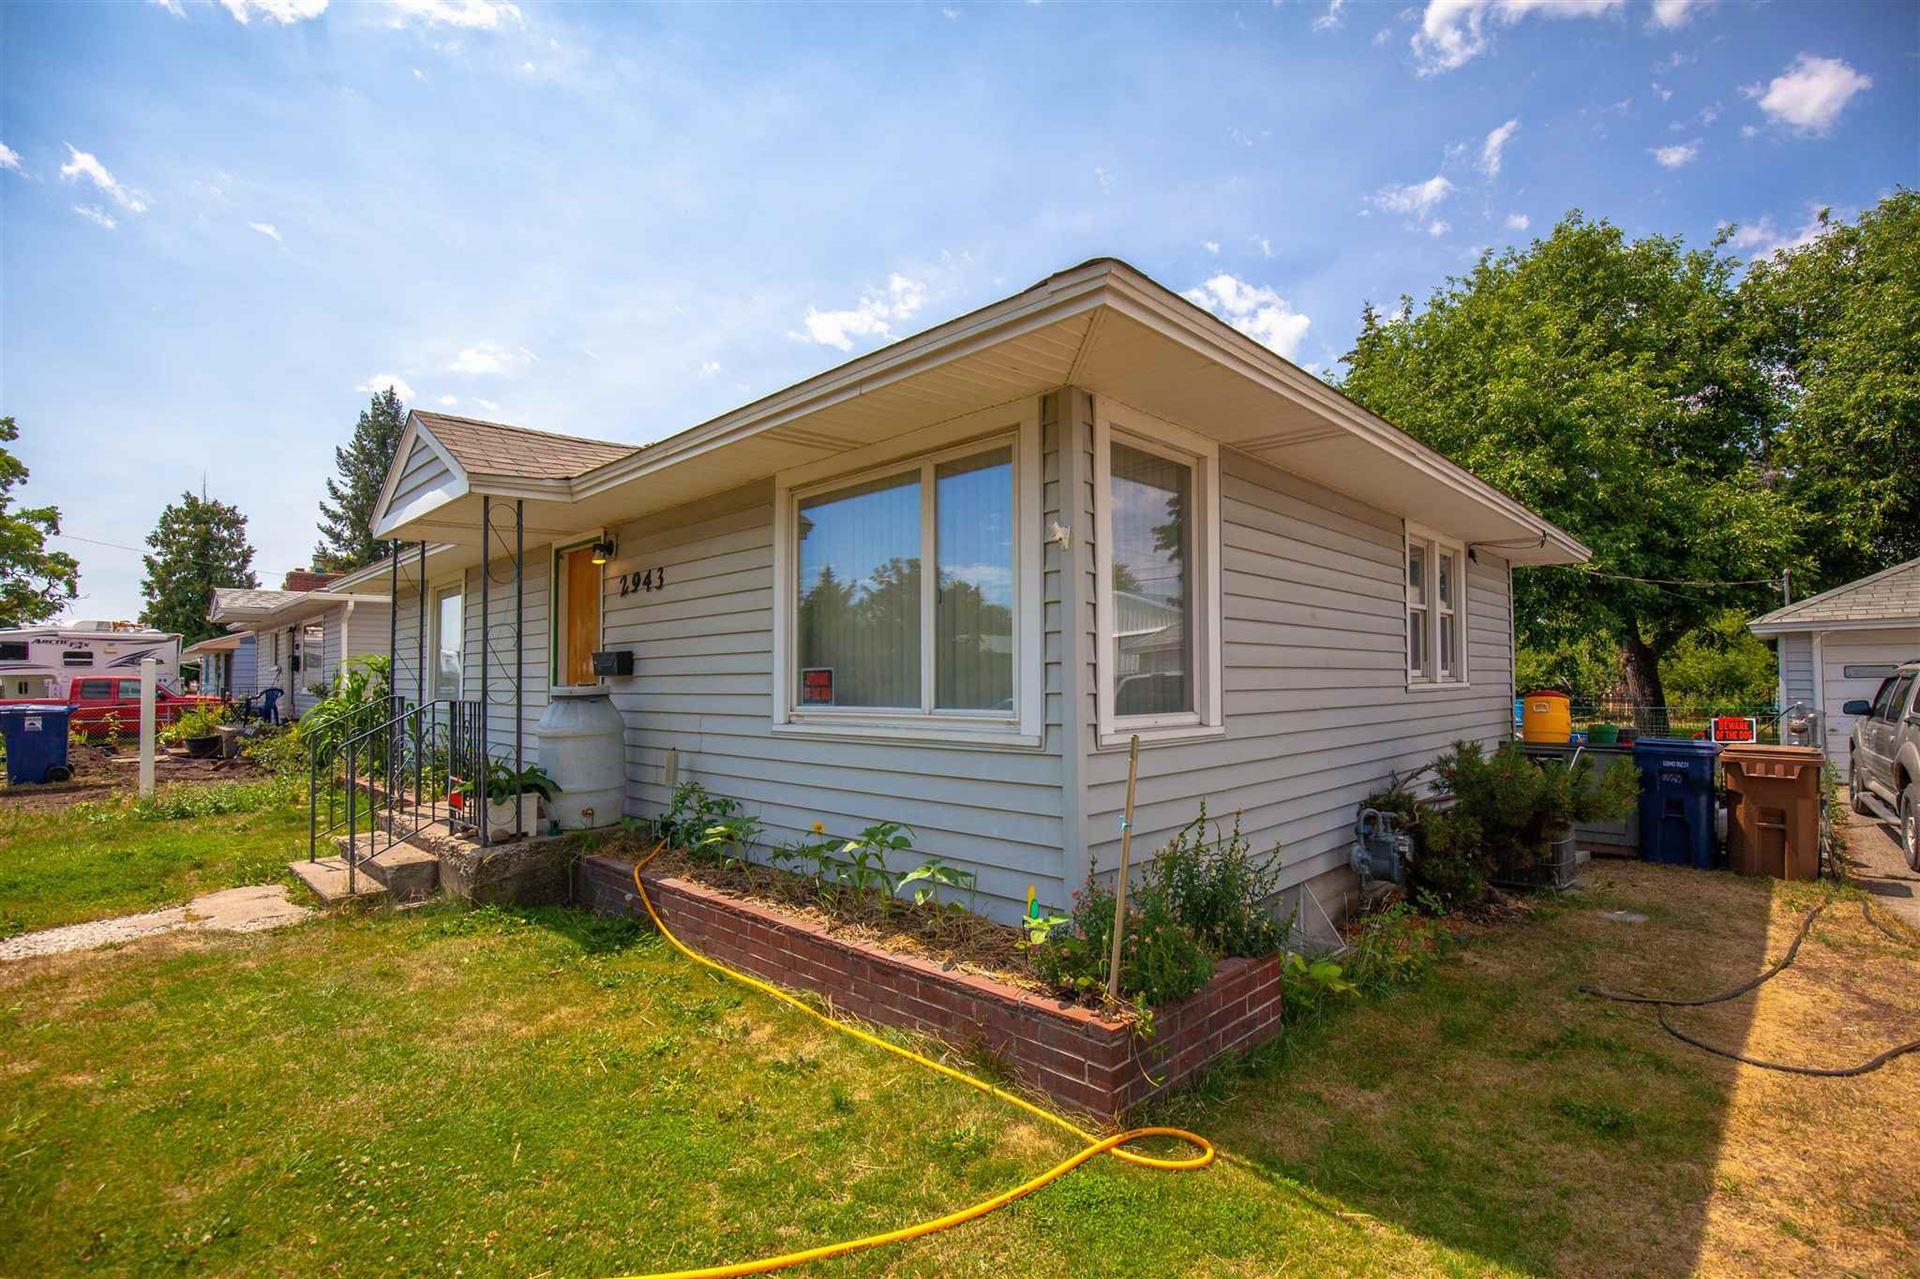 2943 N Smith St, Spokane, WA 99207 - #: 202119035